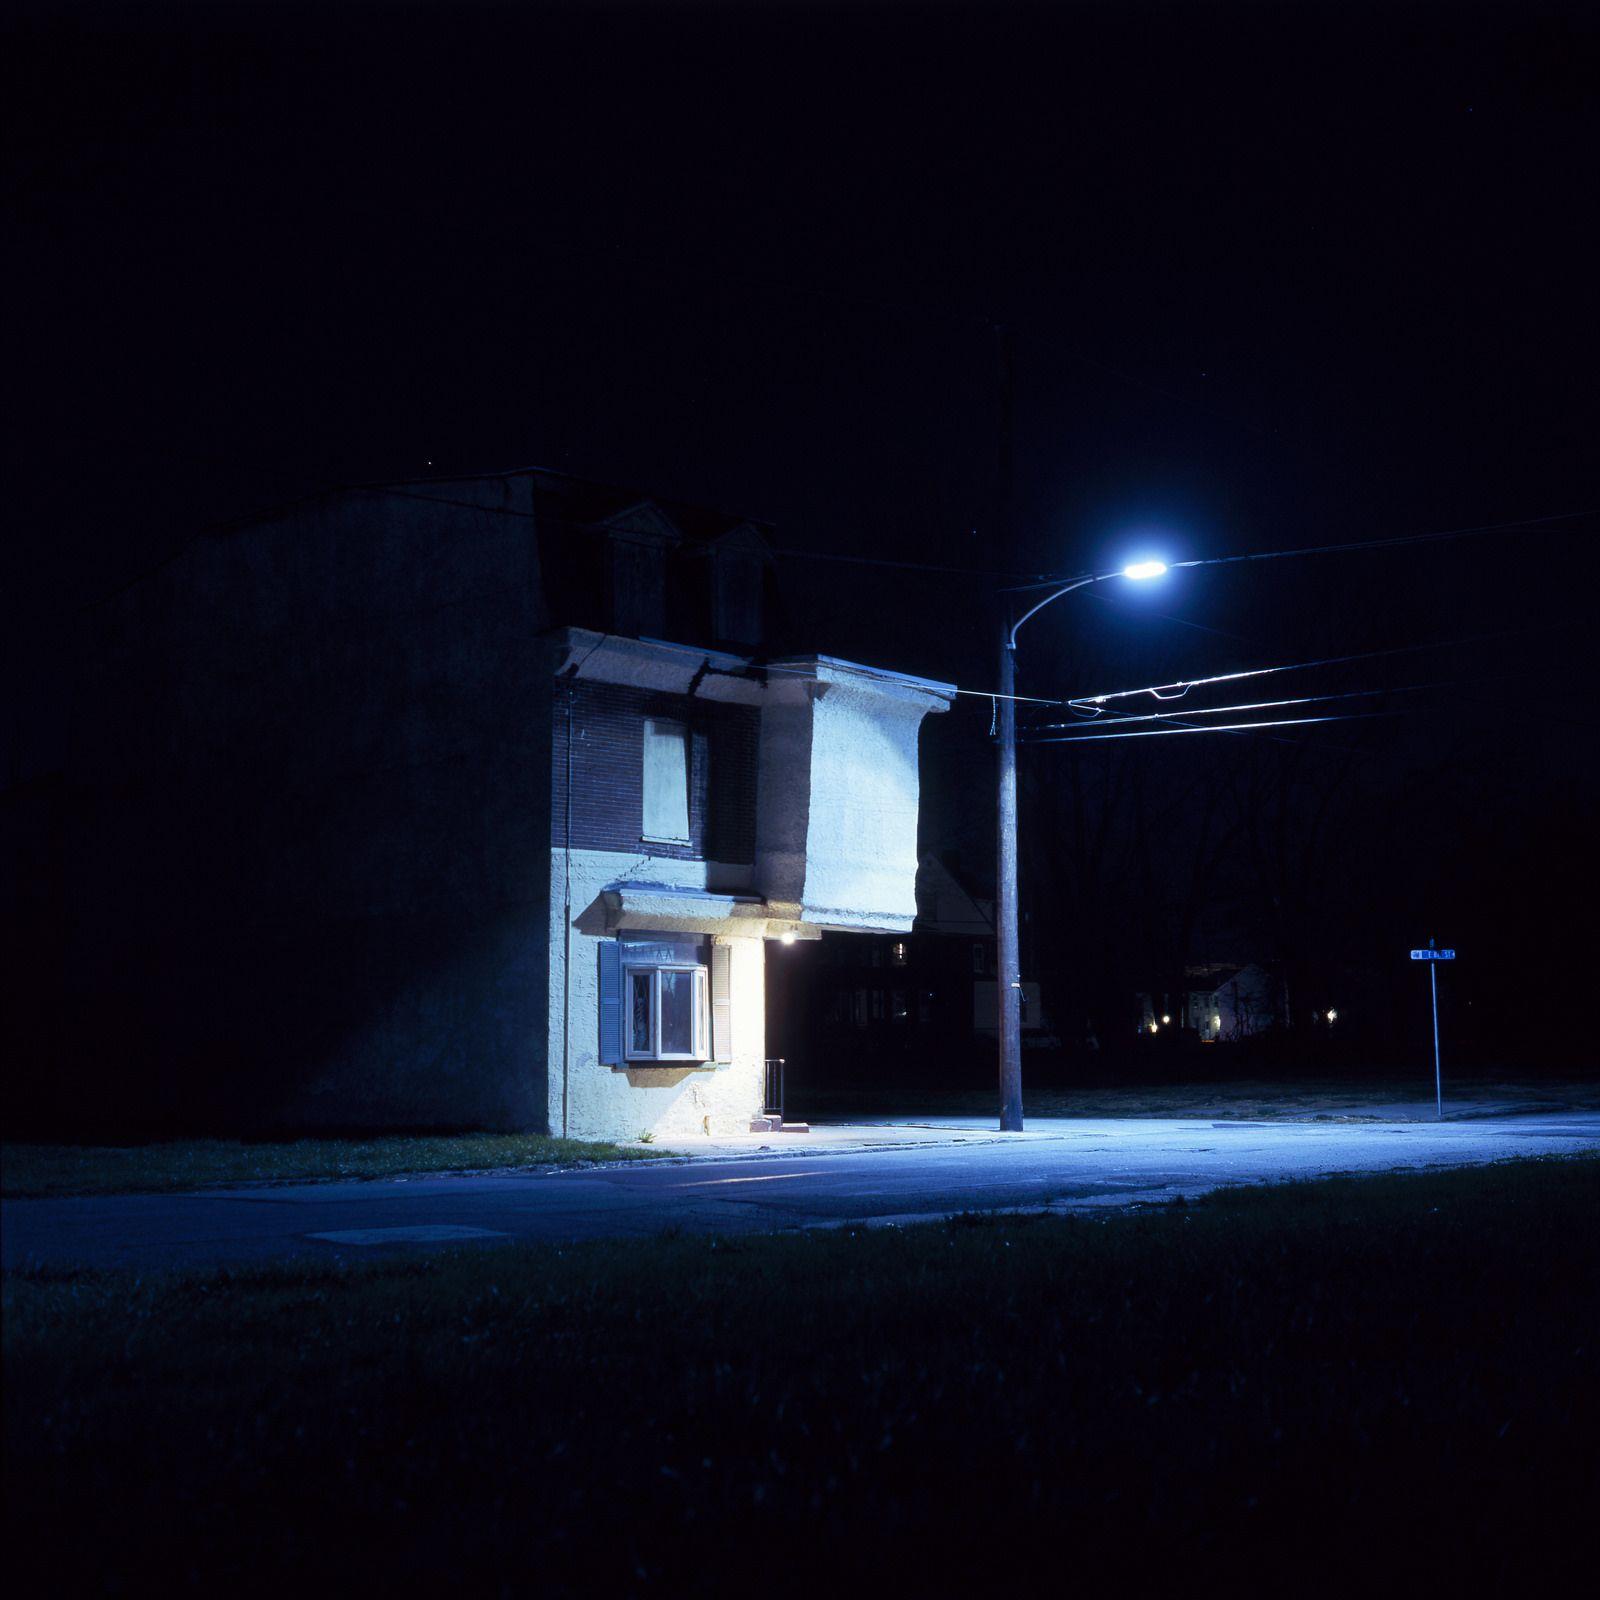 Untitled Urban Landscape Night Photography Landscape Photography